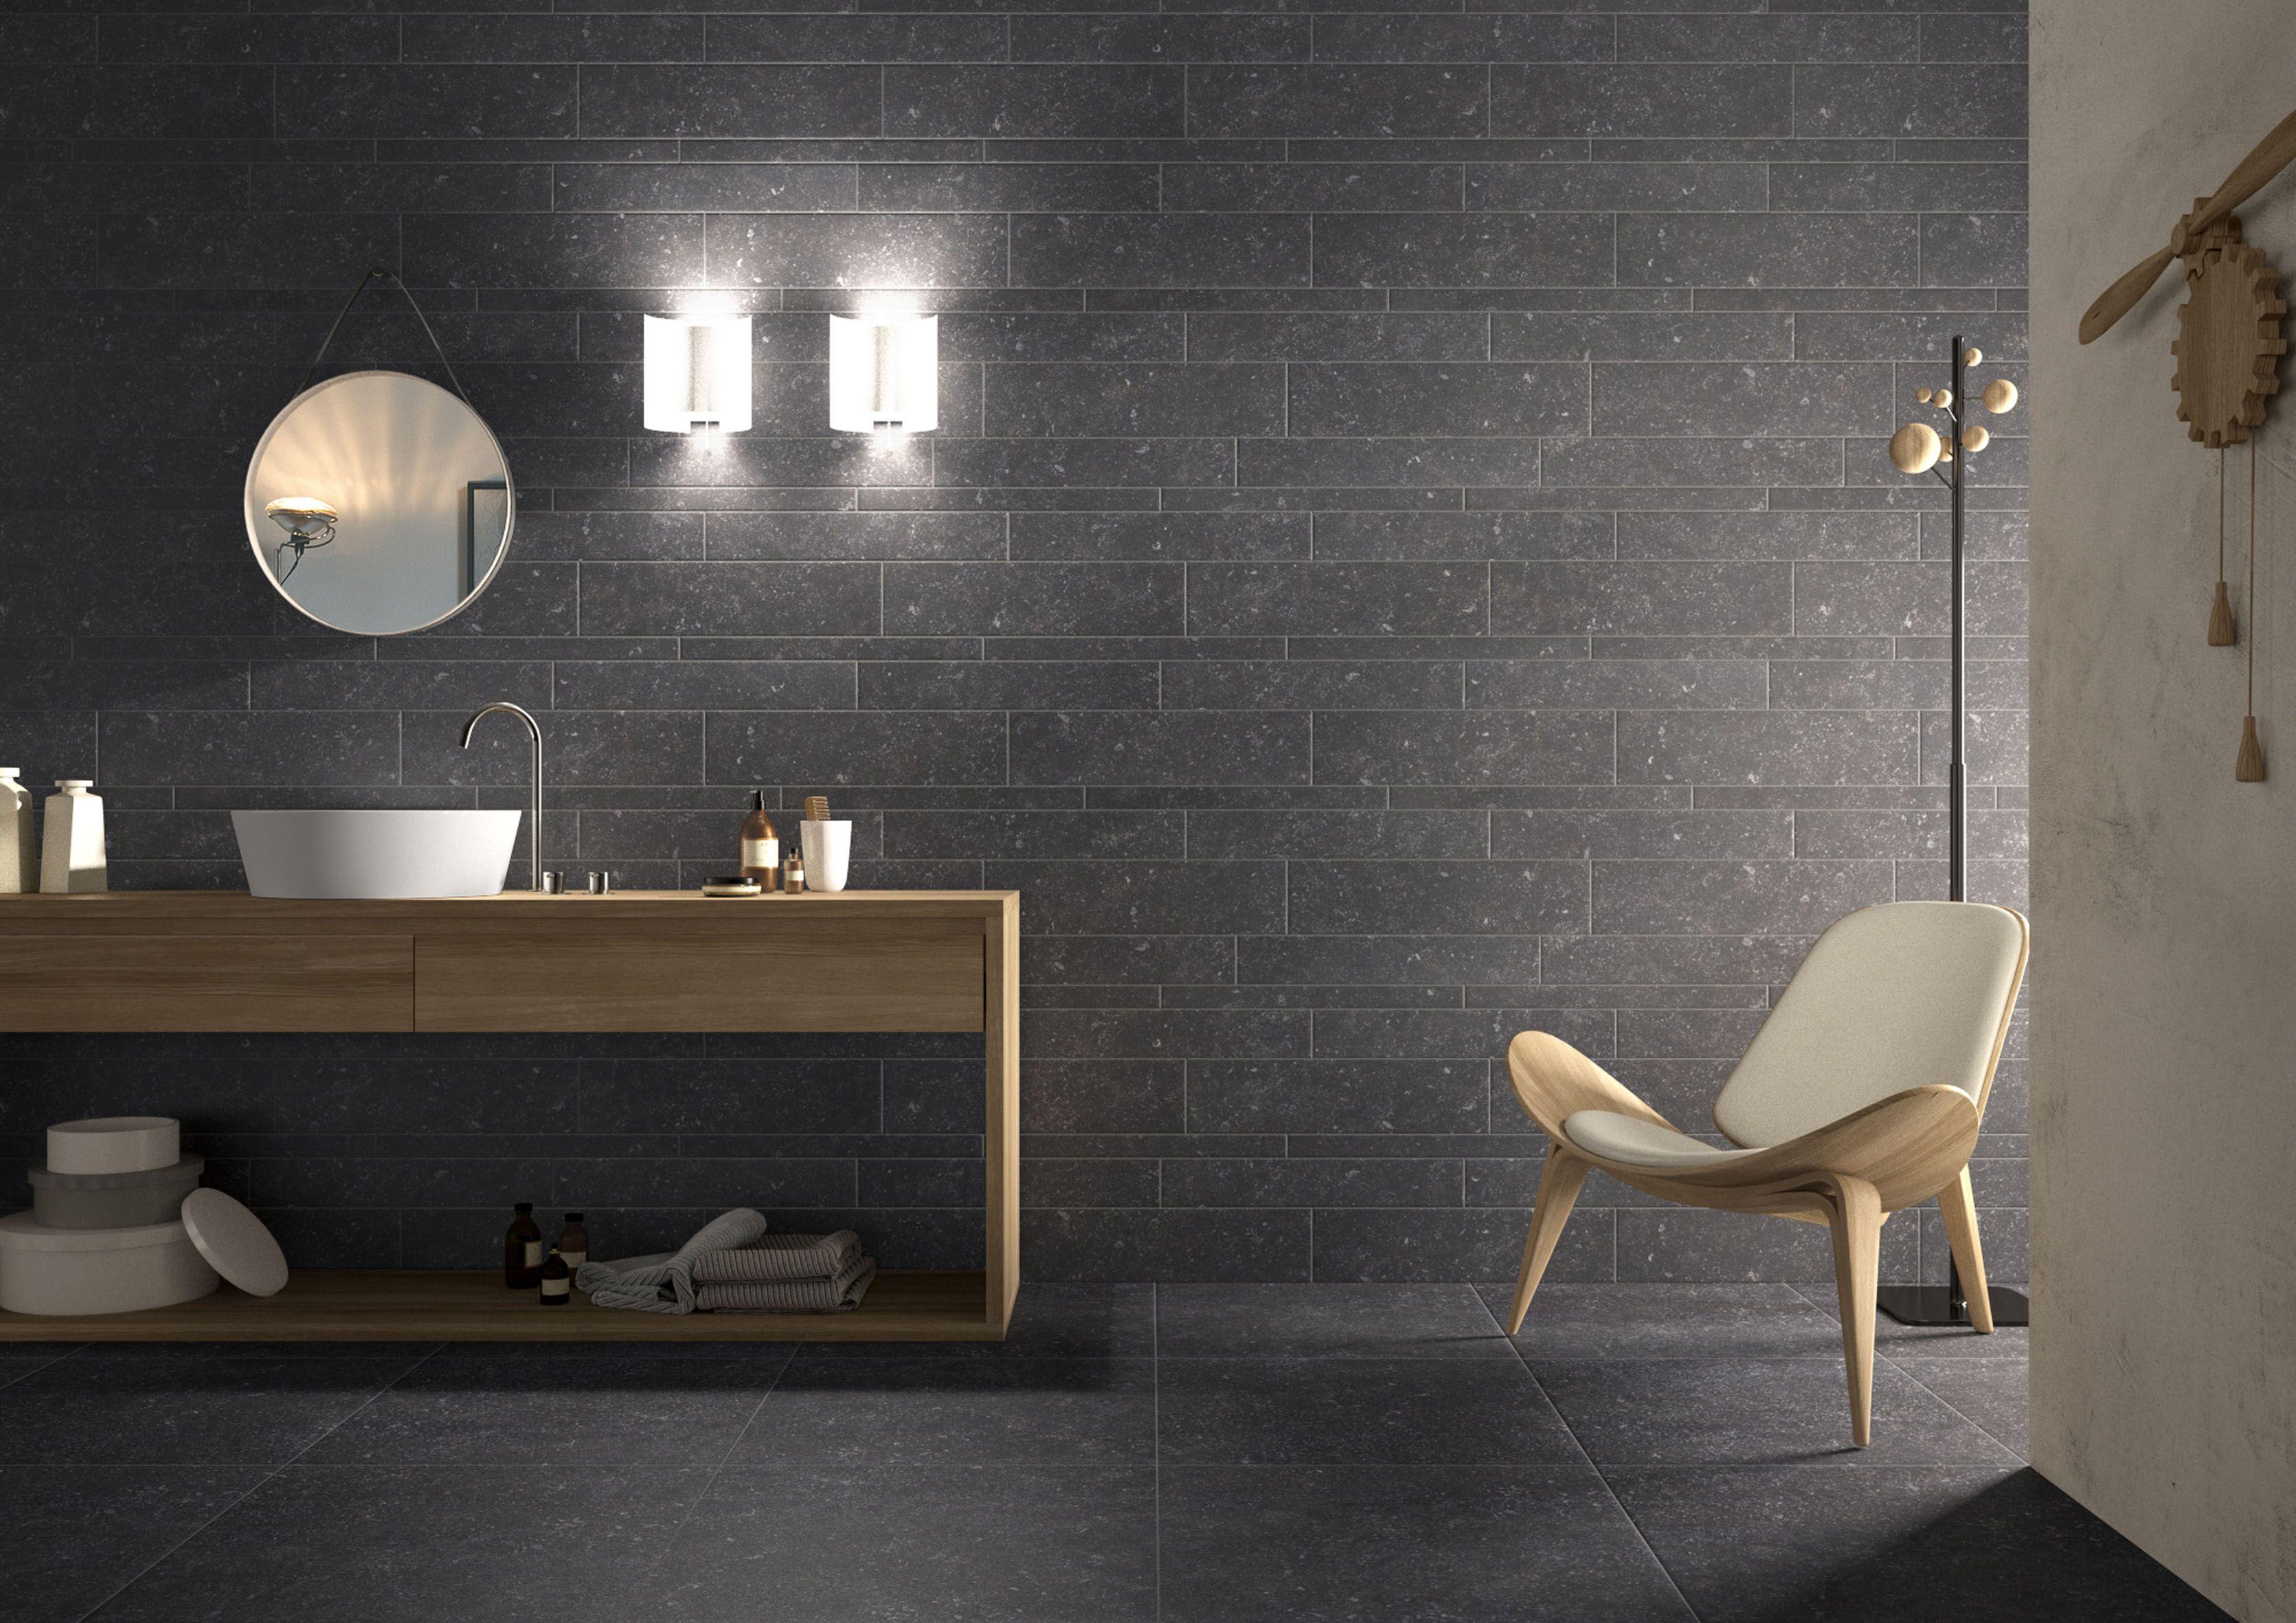 Bagno pietra legno chiaro bagno sotto scandinavian bathroom bathroom flooring e tiles for Bagno moderno grigio